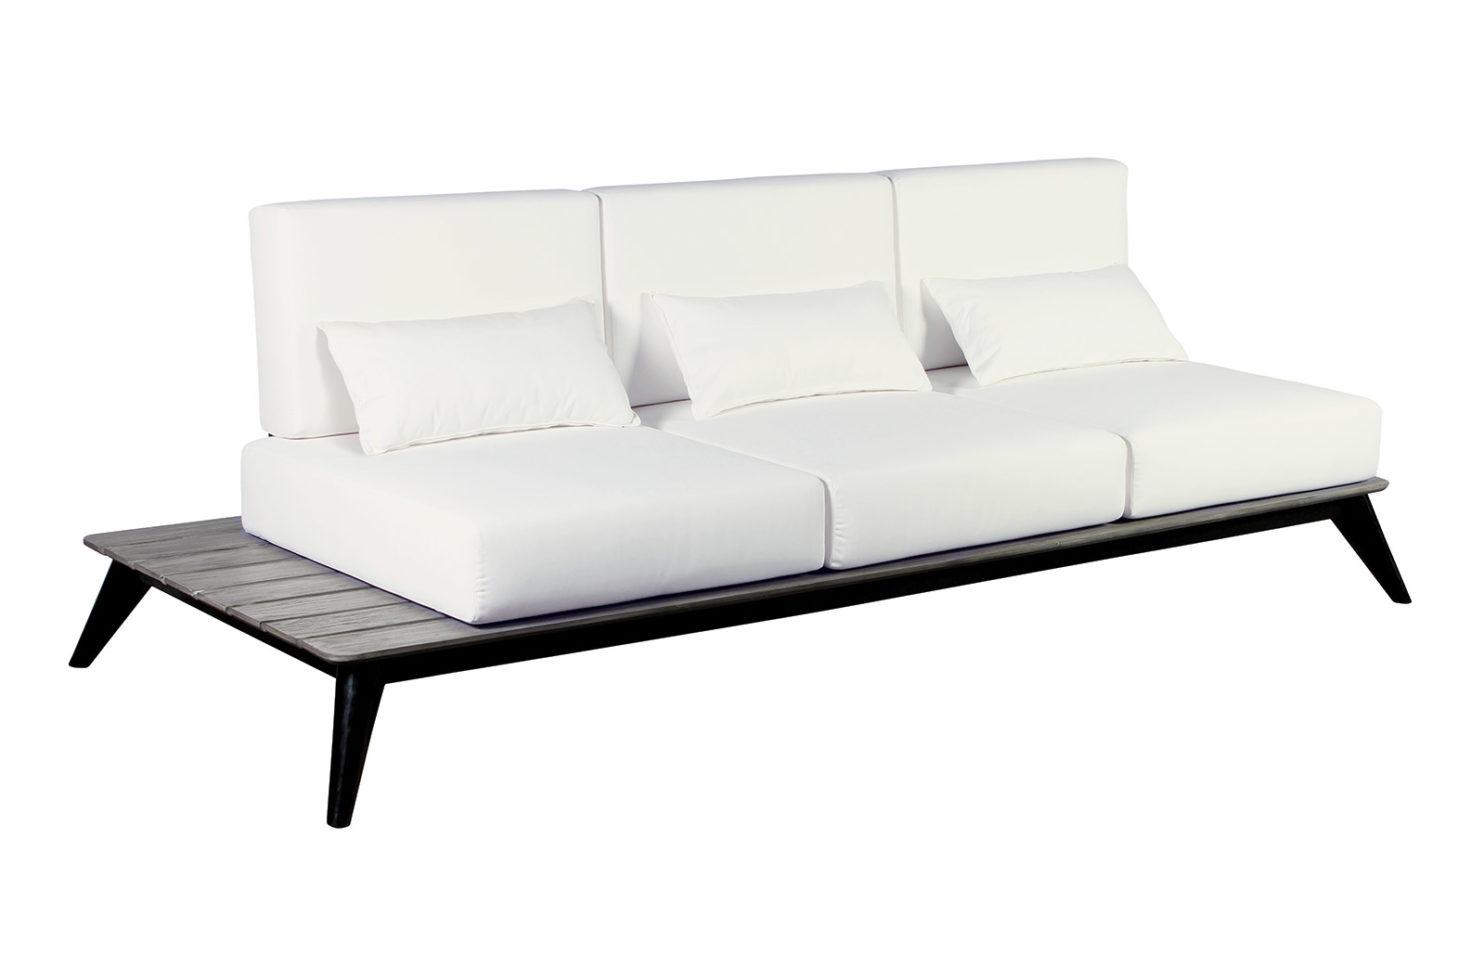 Kakaban Sofa 3-4 Offset 270FT003P2BW